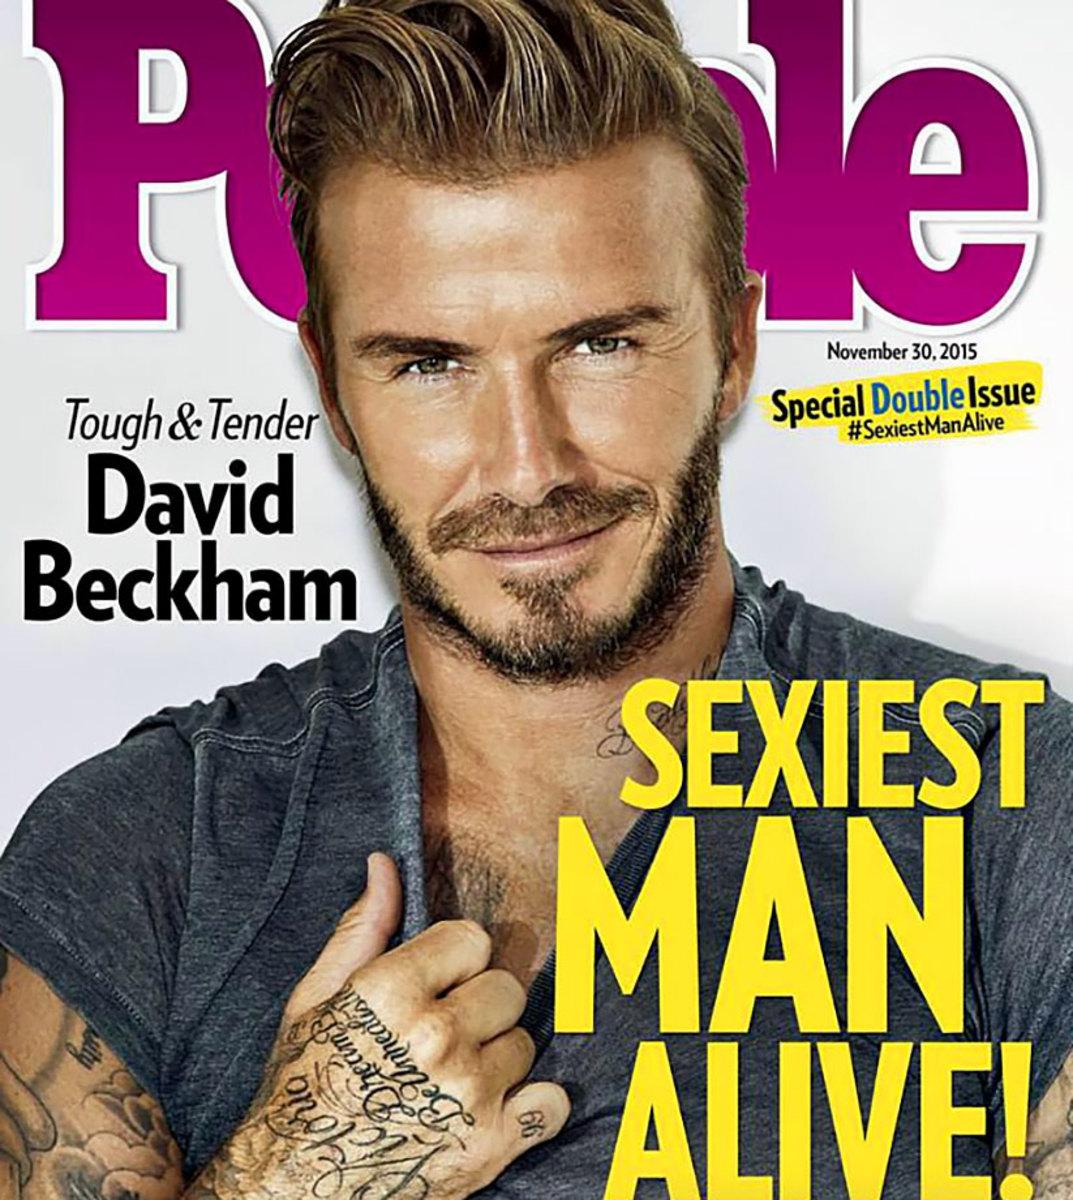 David-Beckham-People-Magazine-Sexiest-Man-Alive_0.jpg